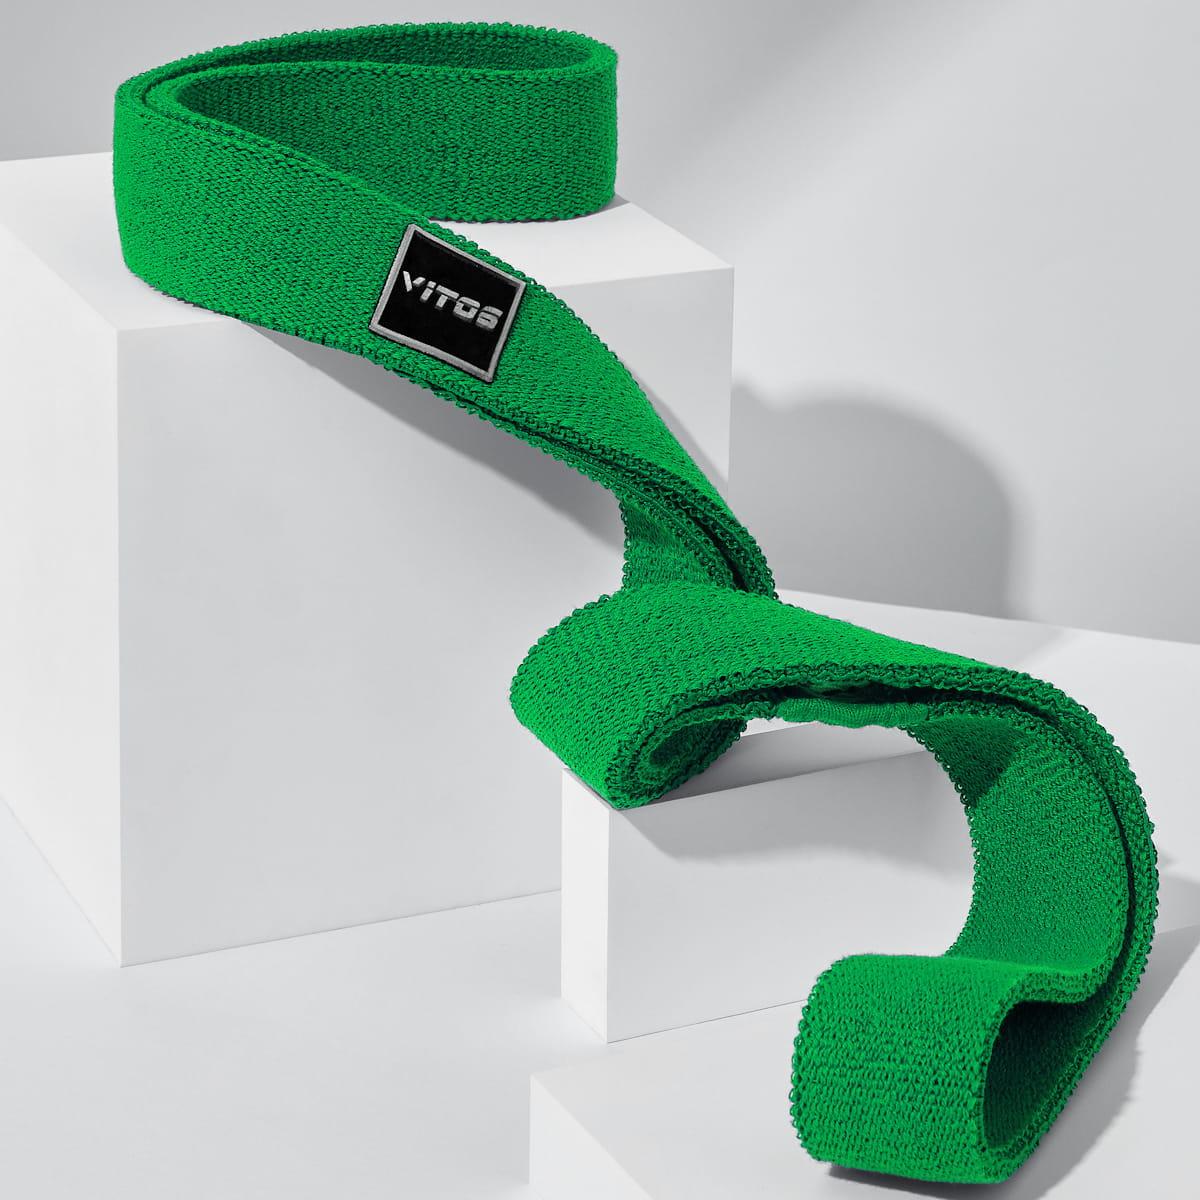 VITOS VPOWER阻力帶 HEAVY綠 9